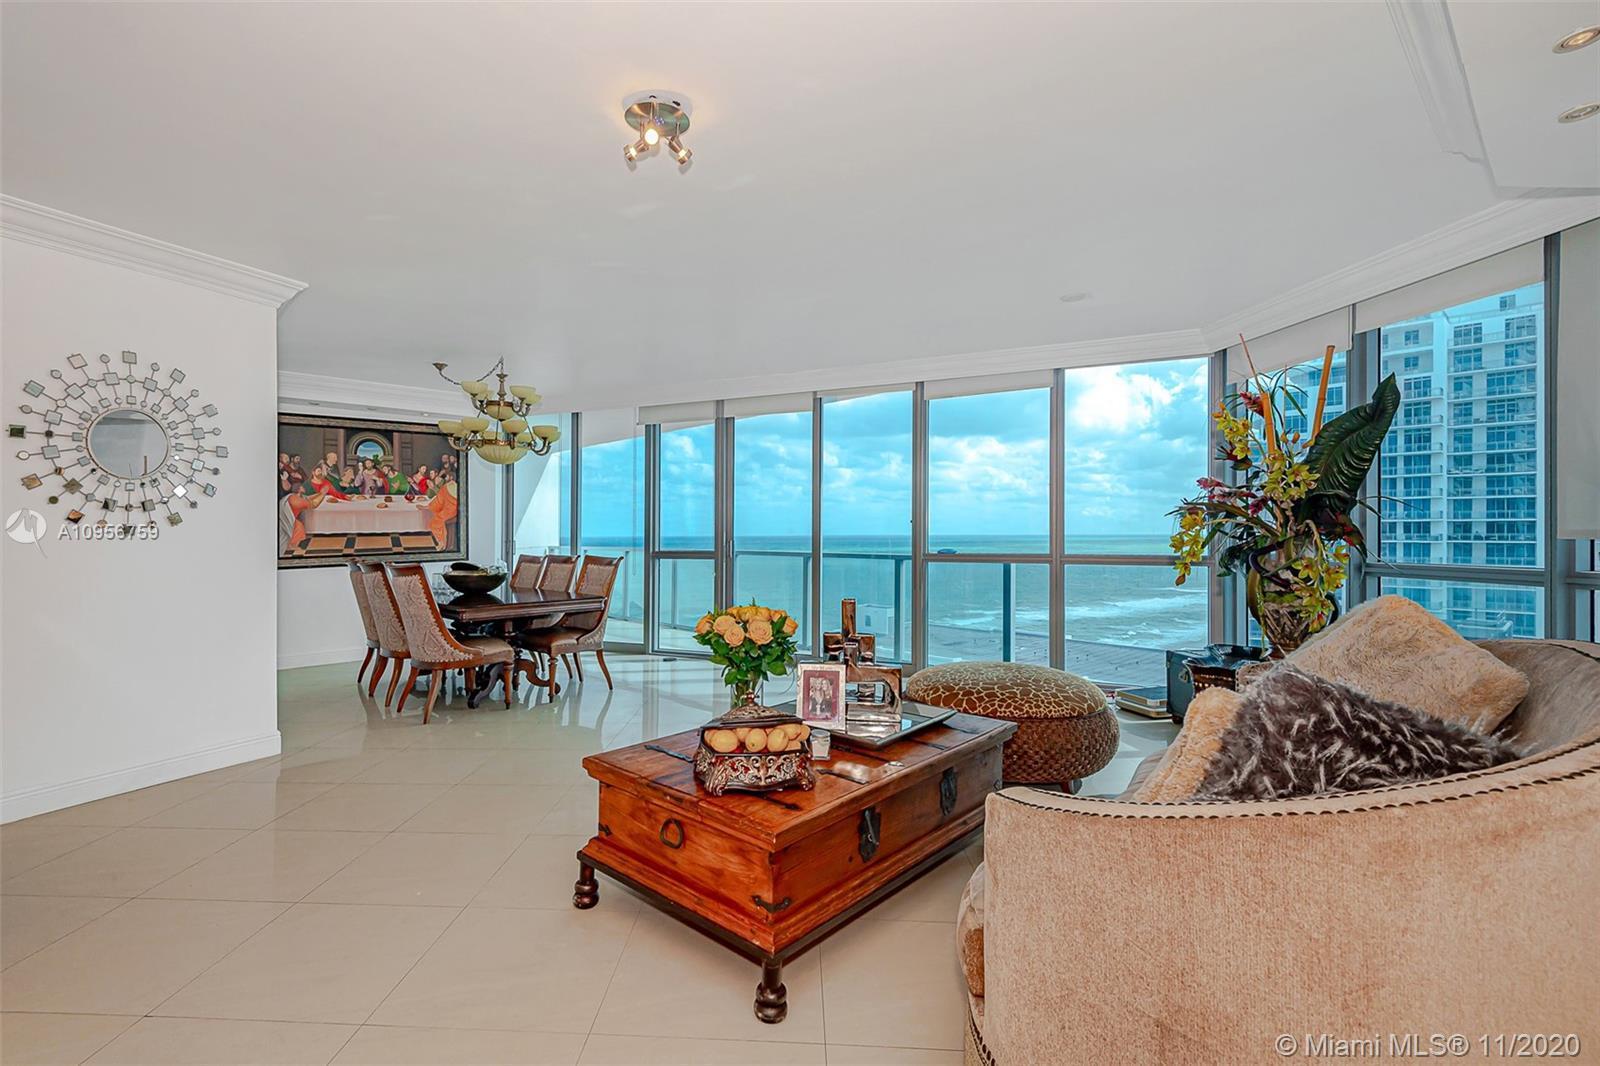 Fantastic Ocean Front Building! Ocean Views Furnished 3 Bedrooms/3 Bathrooms Private Elevators To Gr